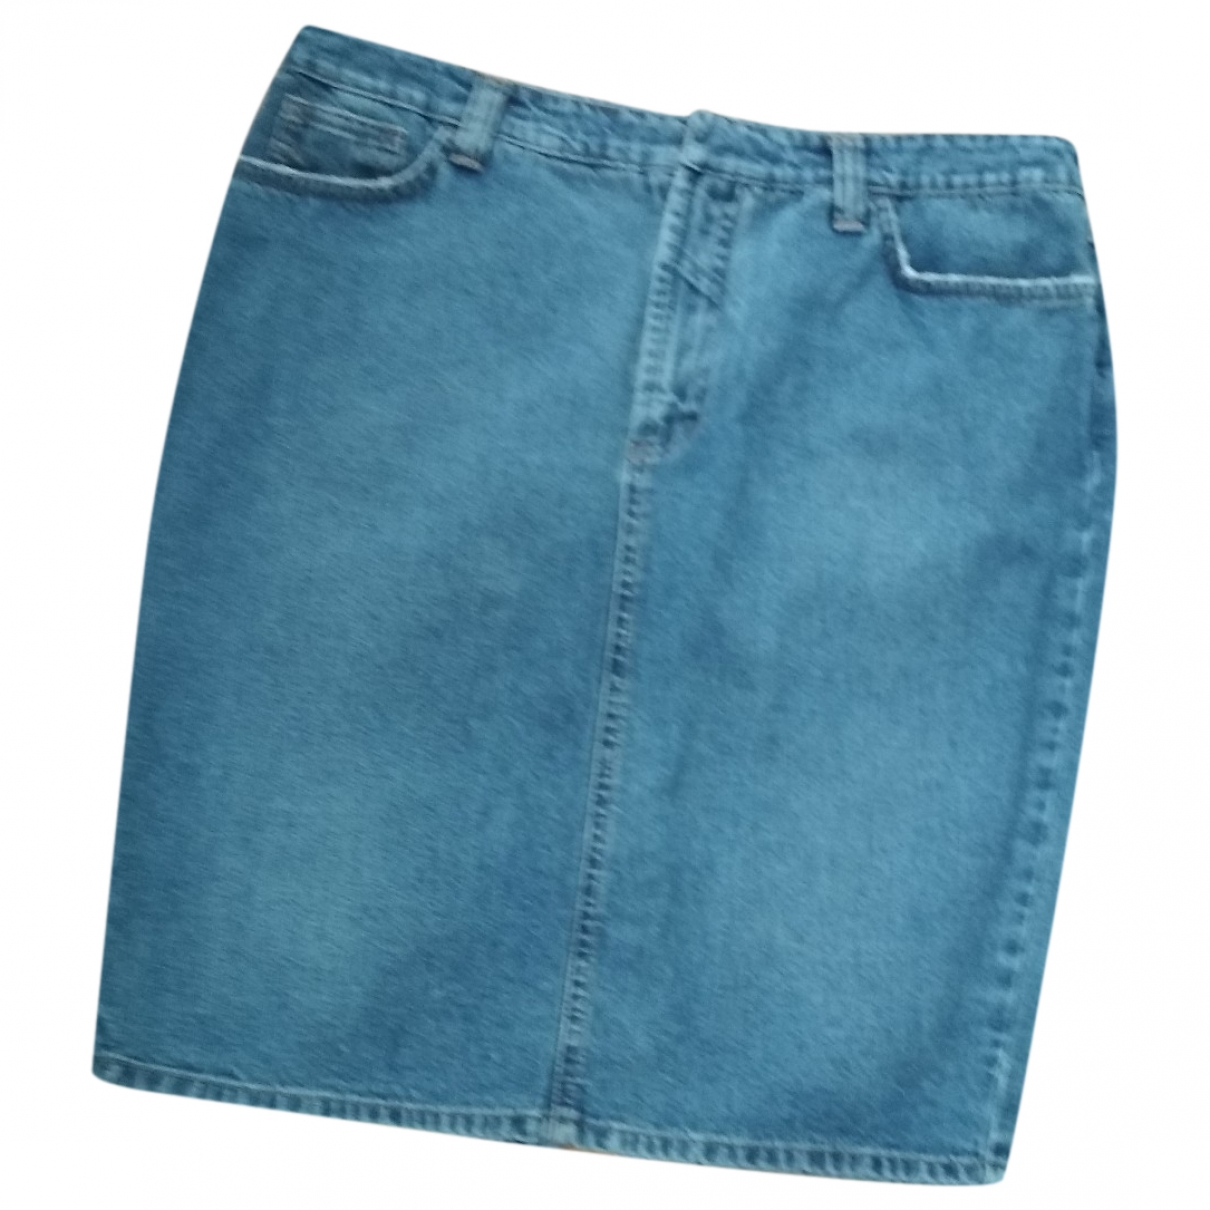 Dolce & Gabbana - Jupe   pour femme en coton - bleu